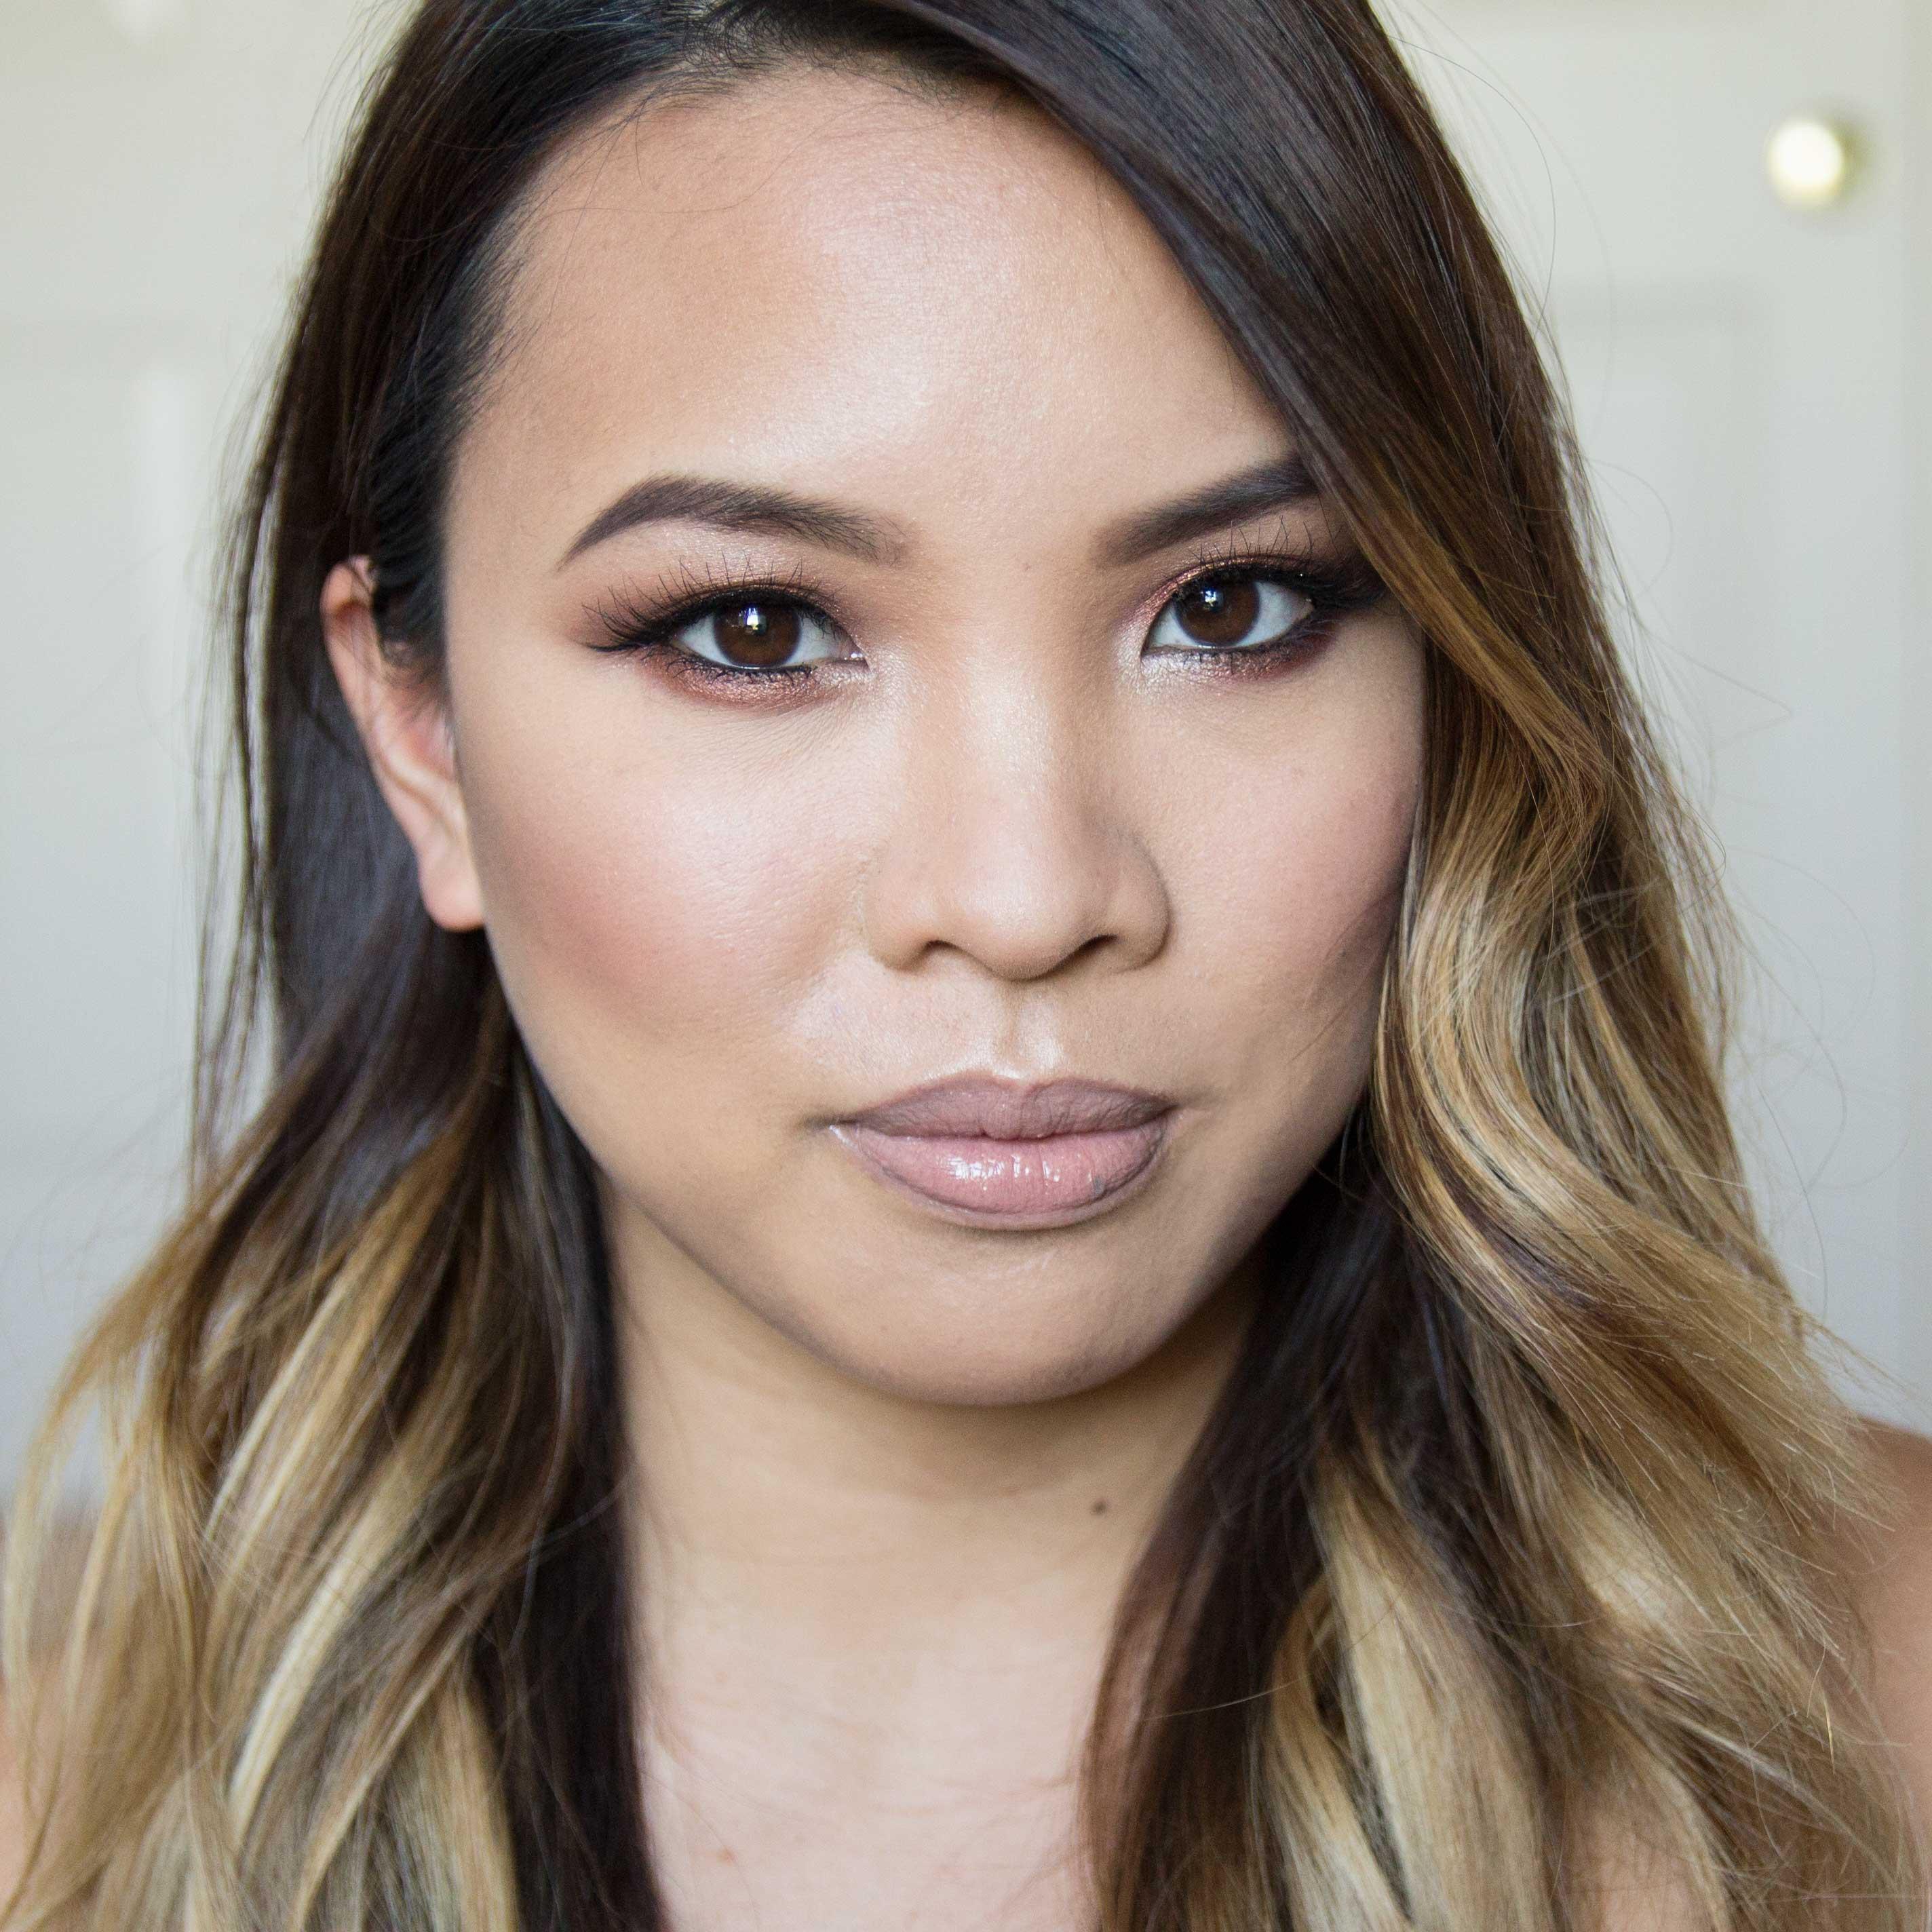 Charlotte Tilbury Dolce Vita Makeup Look